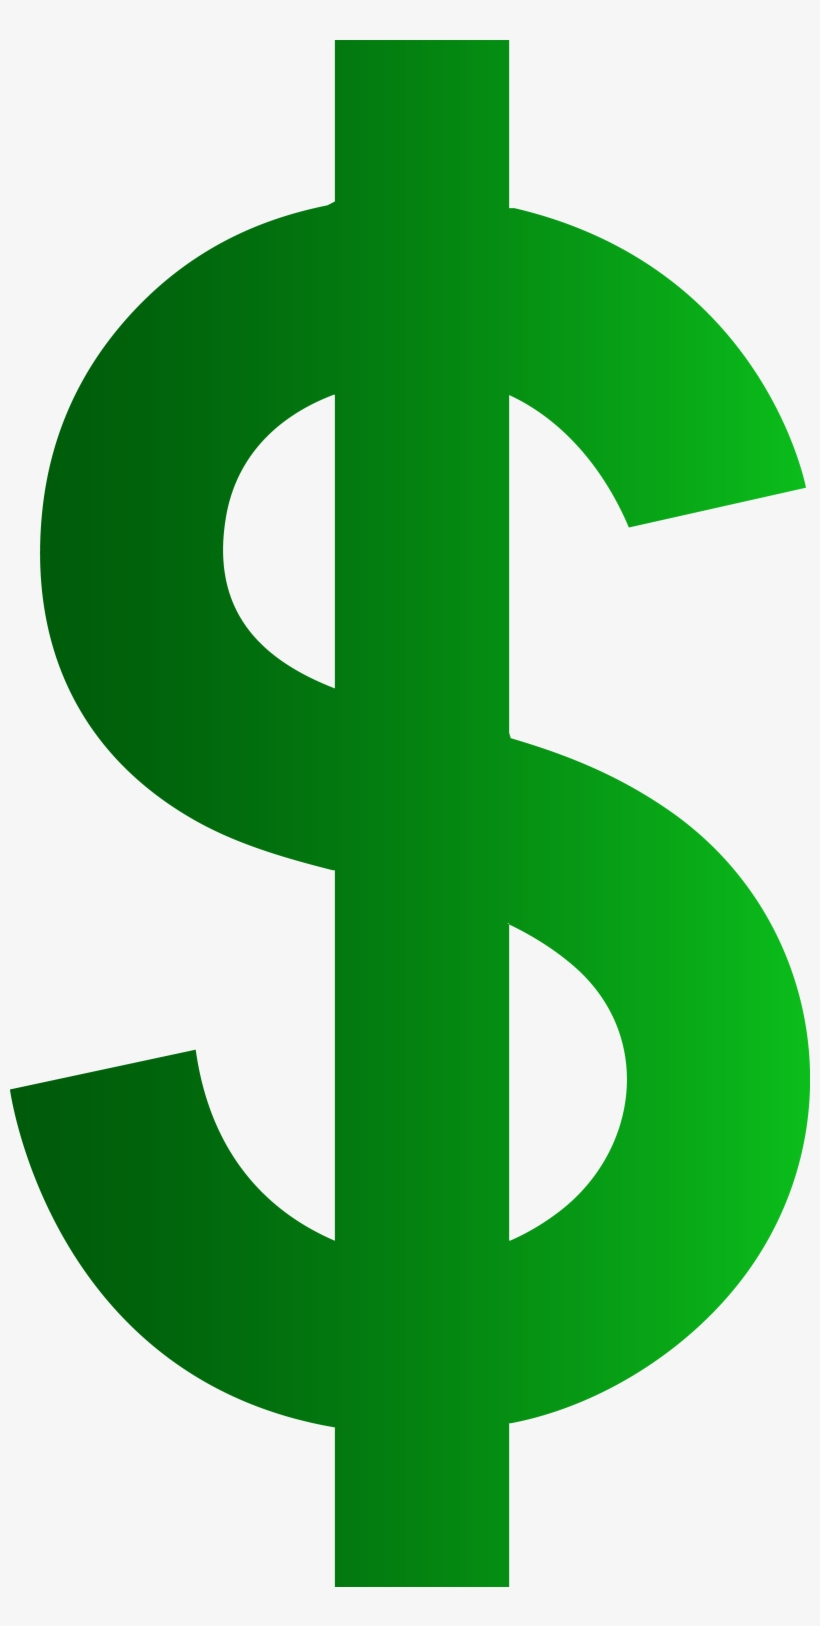 Dollar Png Images Transparent Free Download.